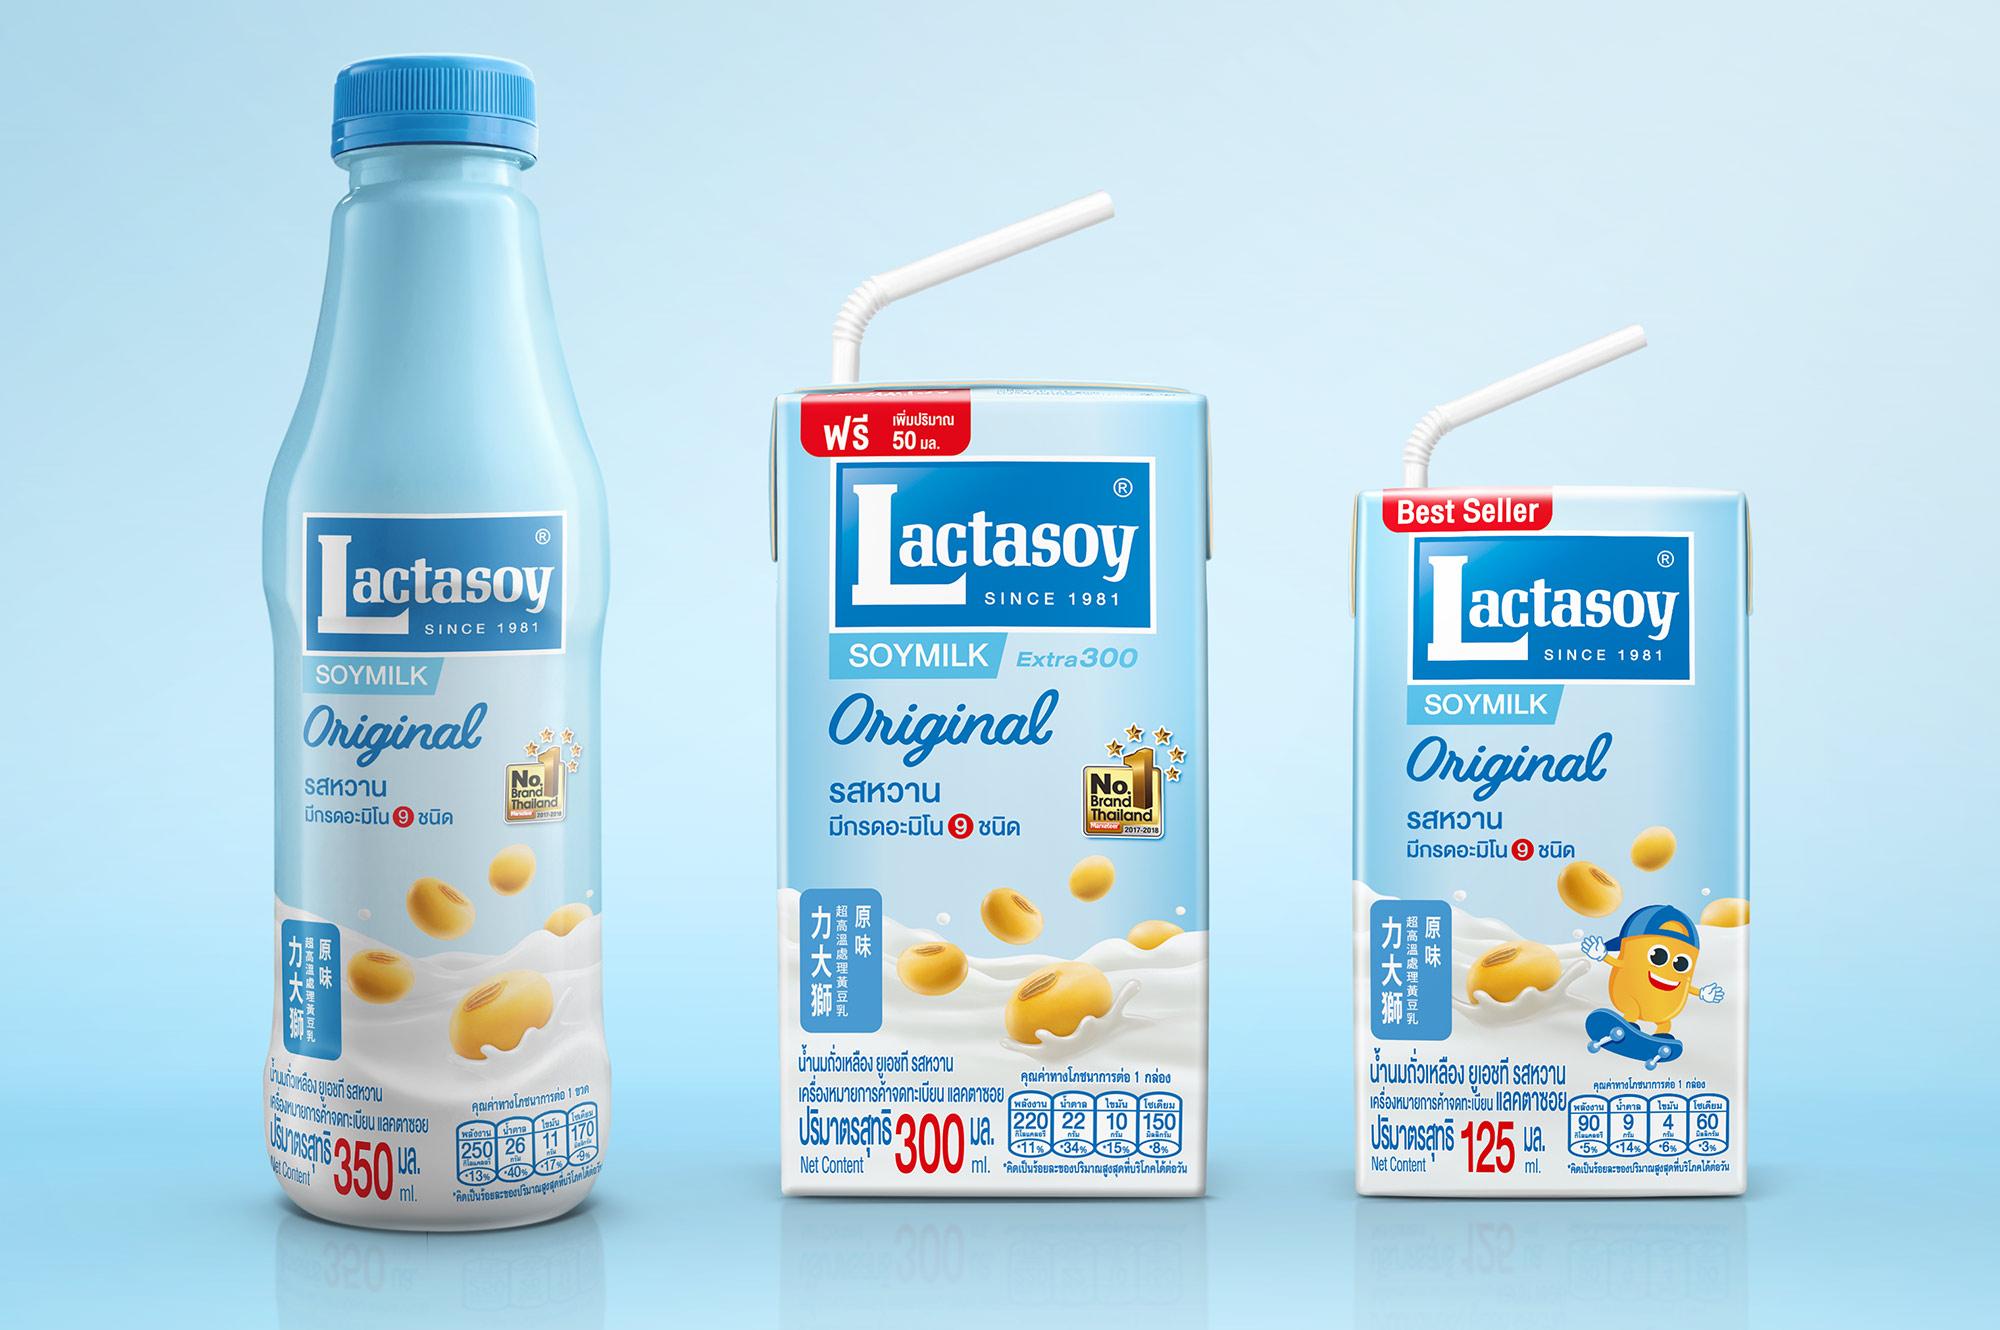 Lactasoy Soy Milk Bottle Cartons